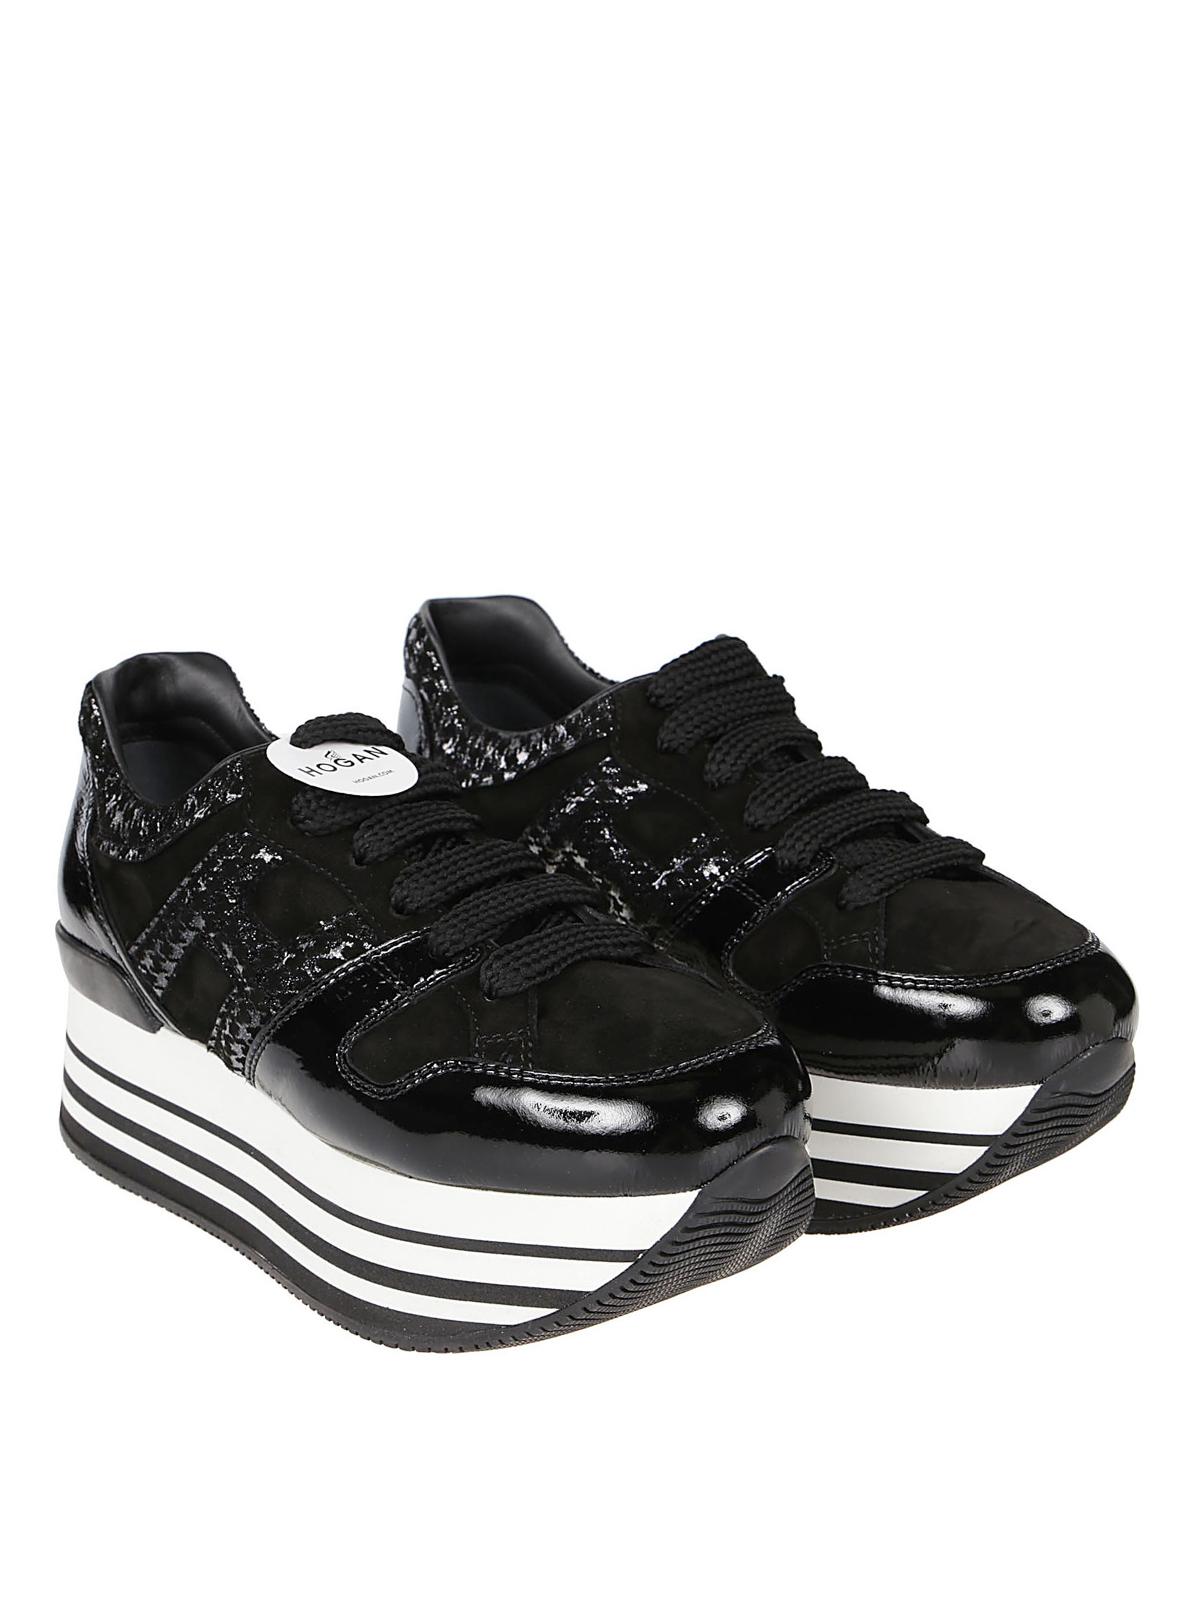 Trainers Hogan - H283 Maxi H222 black sneakers - HXW2830T548LKF0QS5